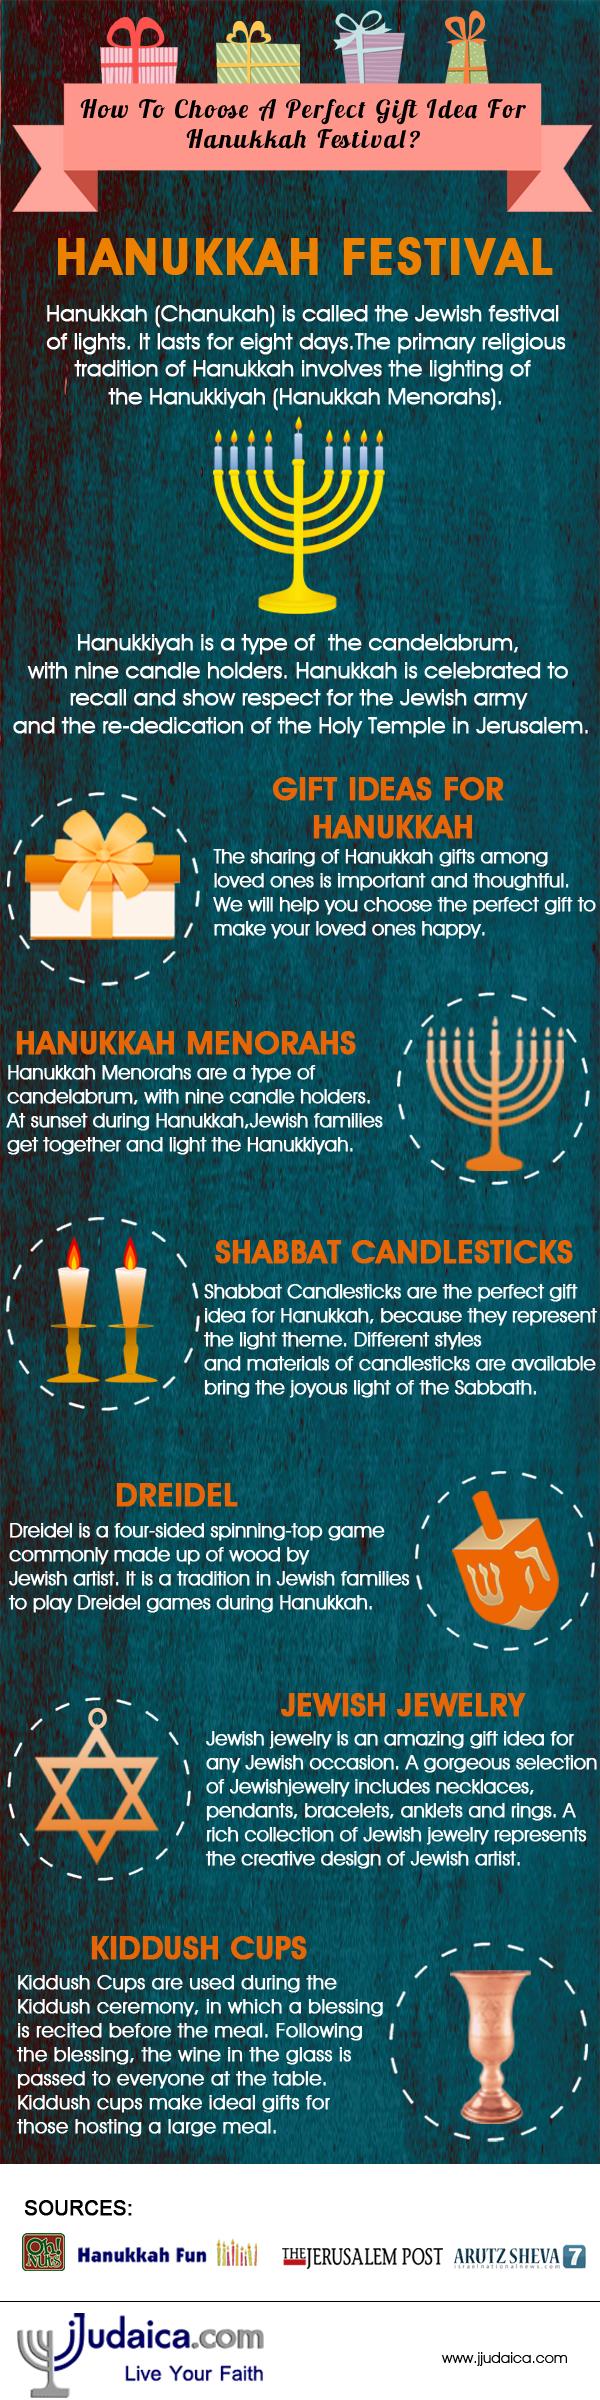 Hanukkah Gifts Infographic